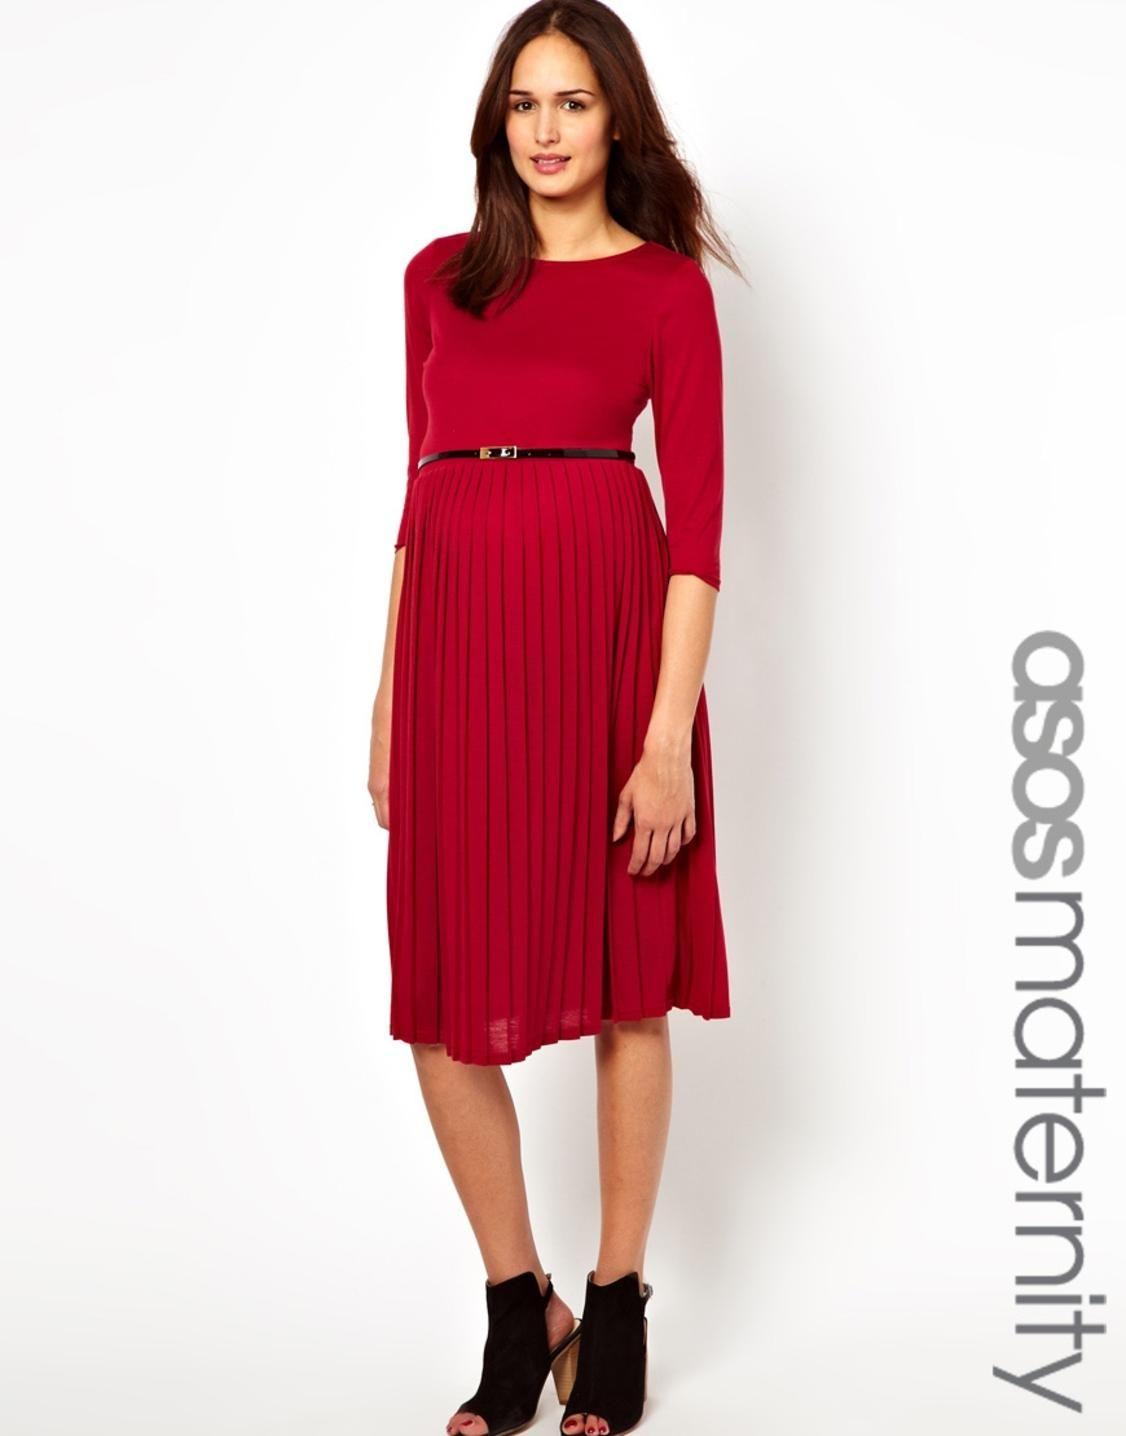 Asos maternity midi dress with pleated skirt httppicvpic asos maternity midi dress with pleated skirt httppicvpicwomen ombrellifo Gallery